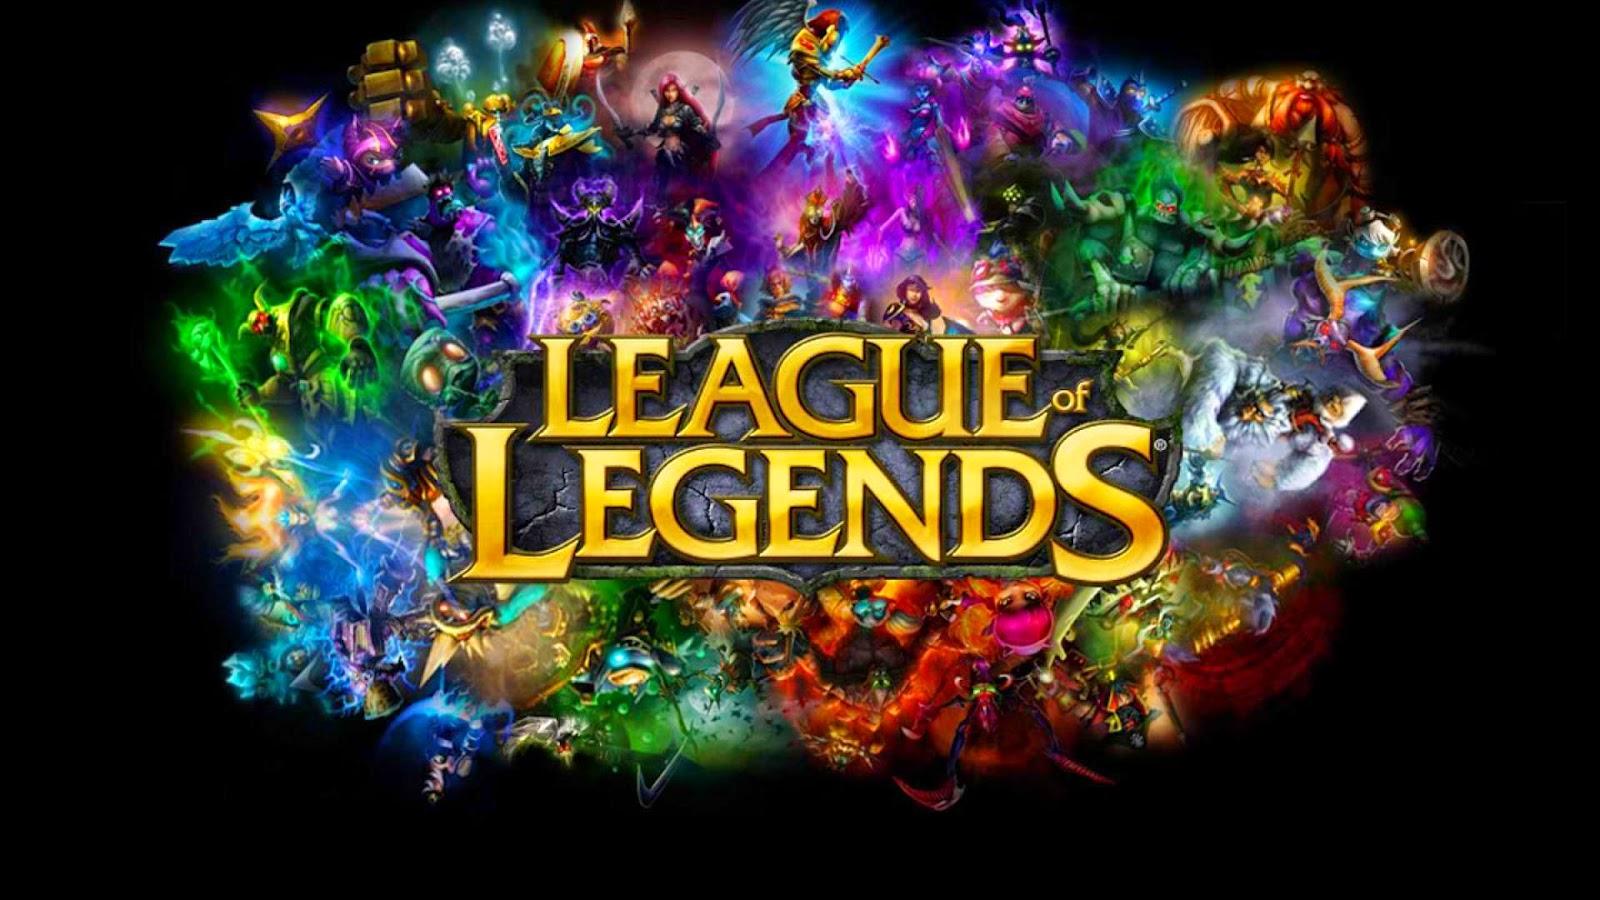 League of Legends hd wallpaper by hdwallsource 2